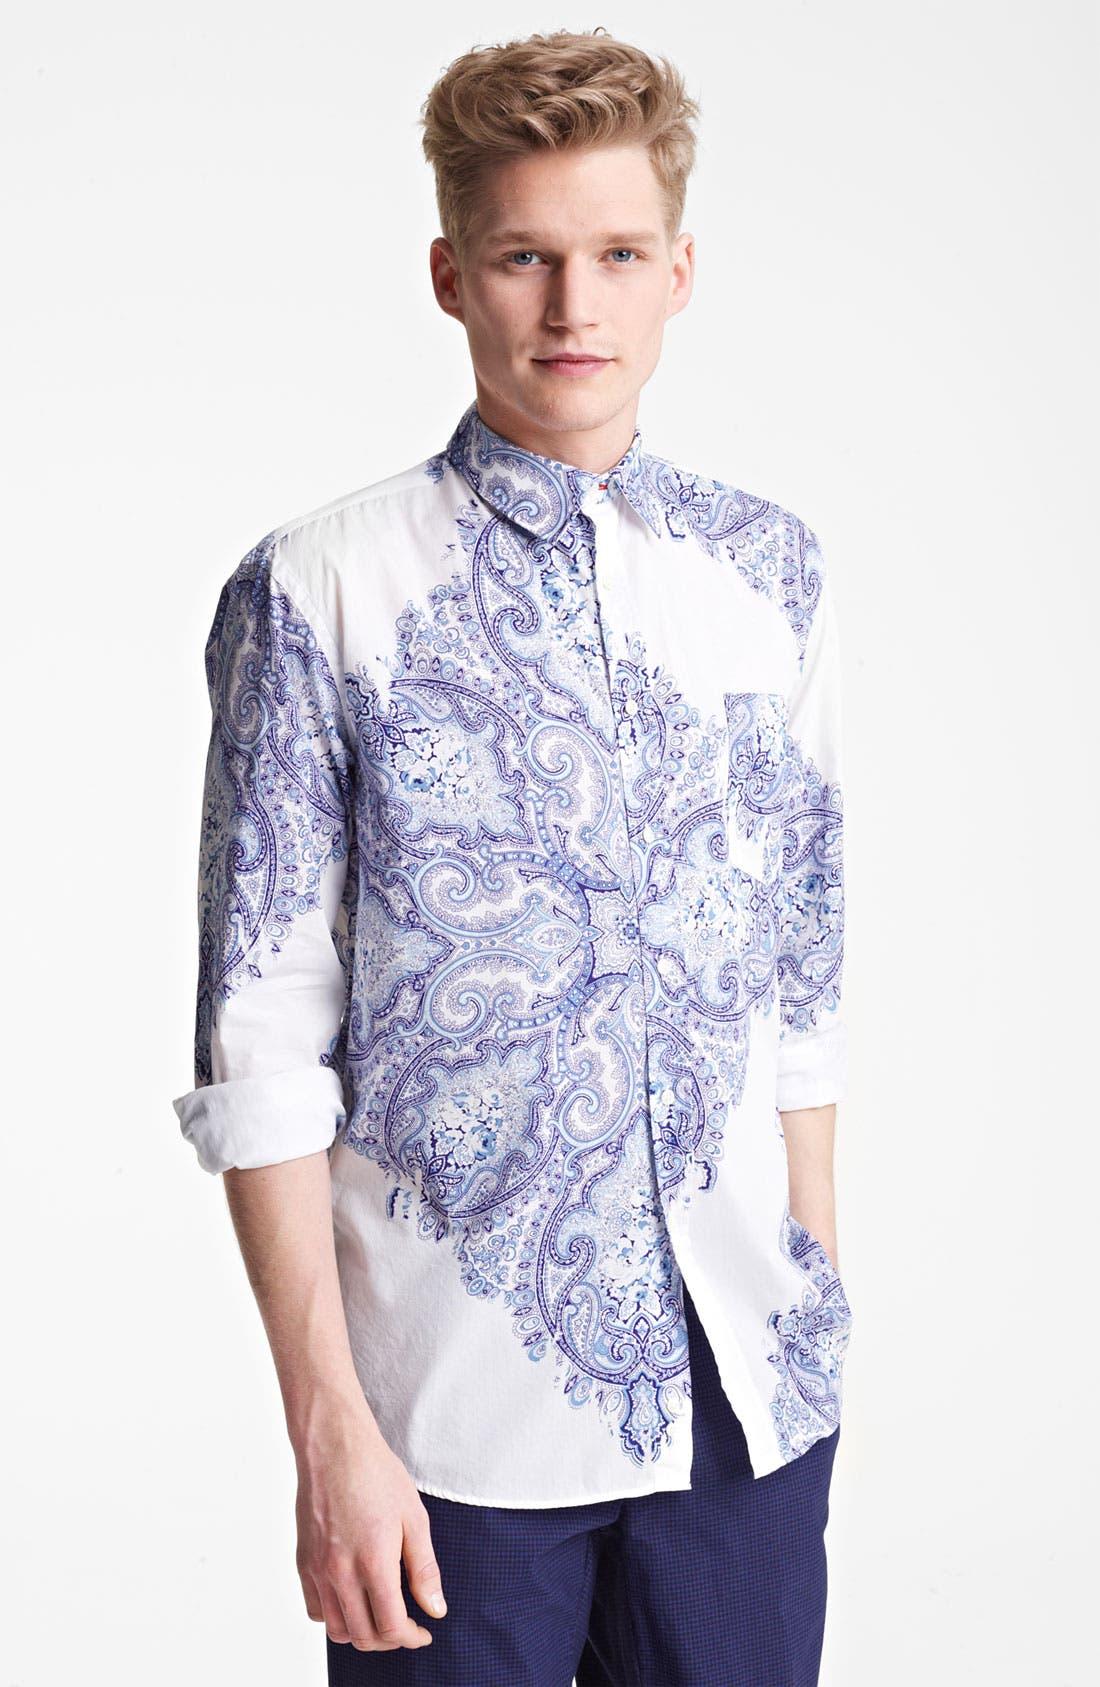 Main Image - Mason's Paisley Print Woven Shirt